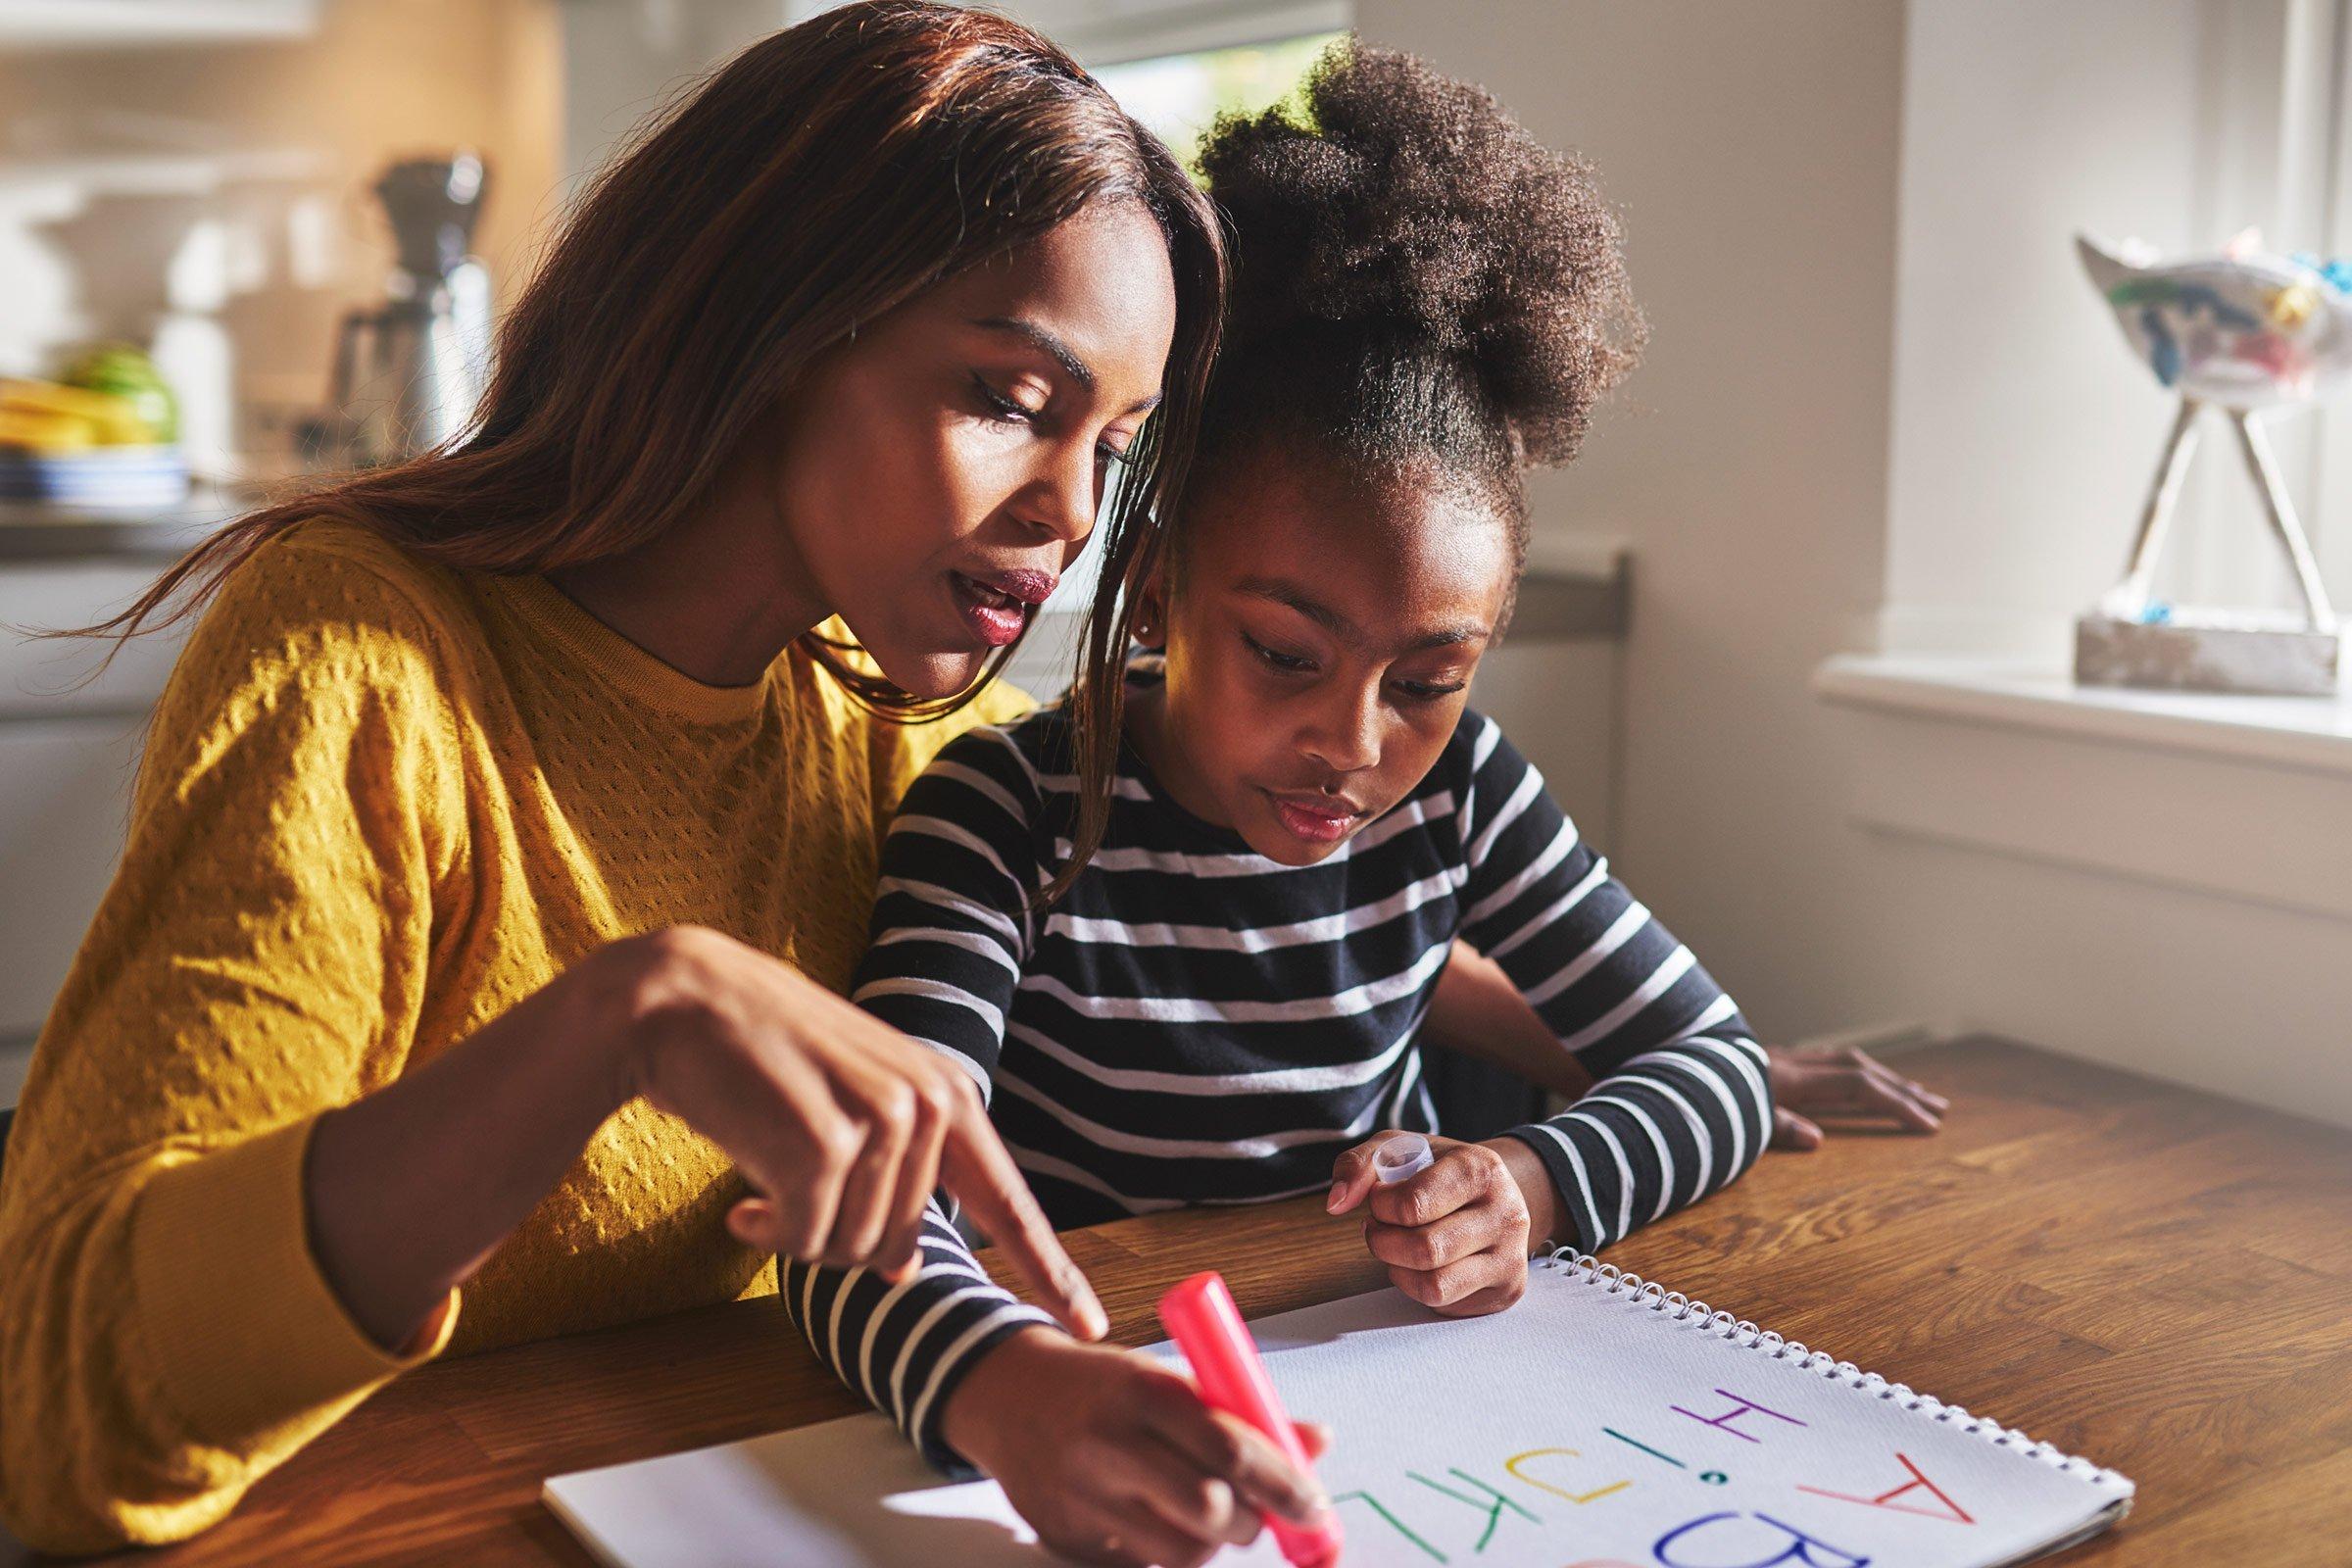 32-your-childs-teacher-mom-daughter-homework.